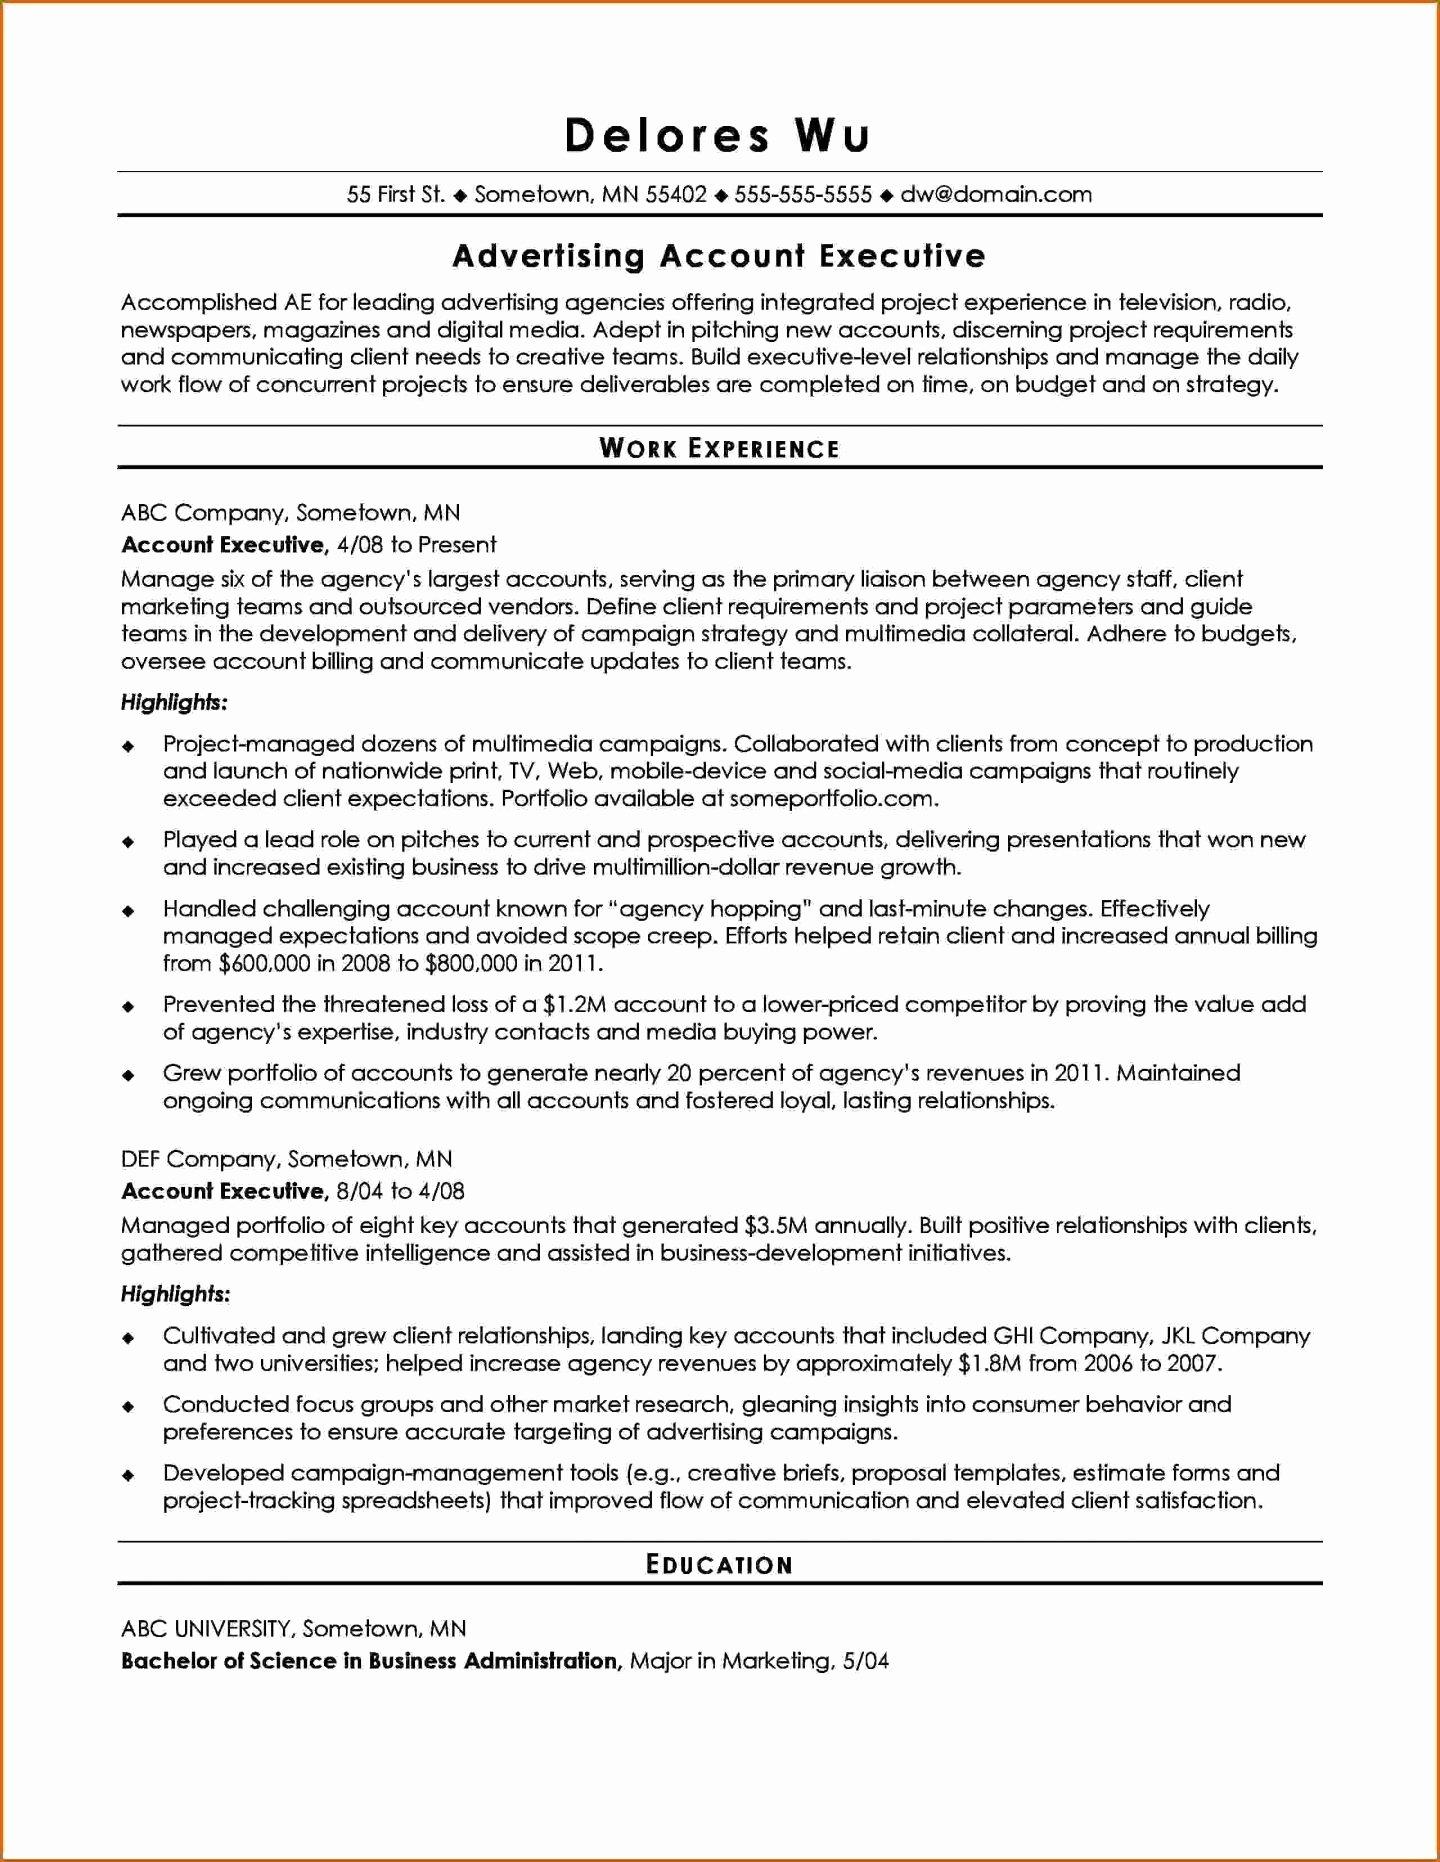 Digital Marketing Contract Template Beautiful [download] Digital Marketing Contract Template Bonsai